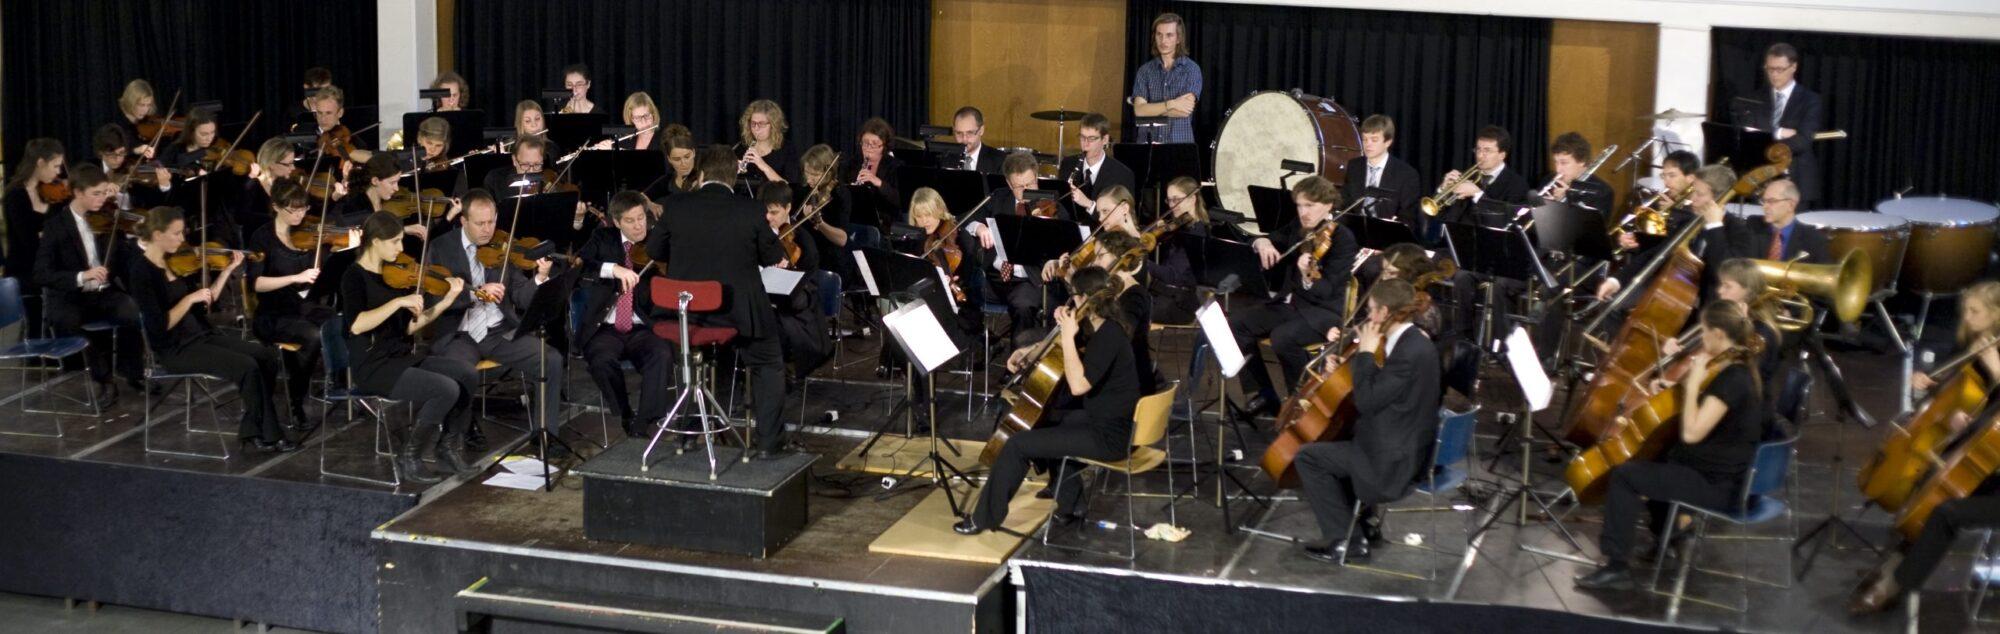 GASO - Göteborgs Akademiska Symfoniorkester